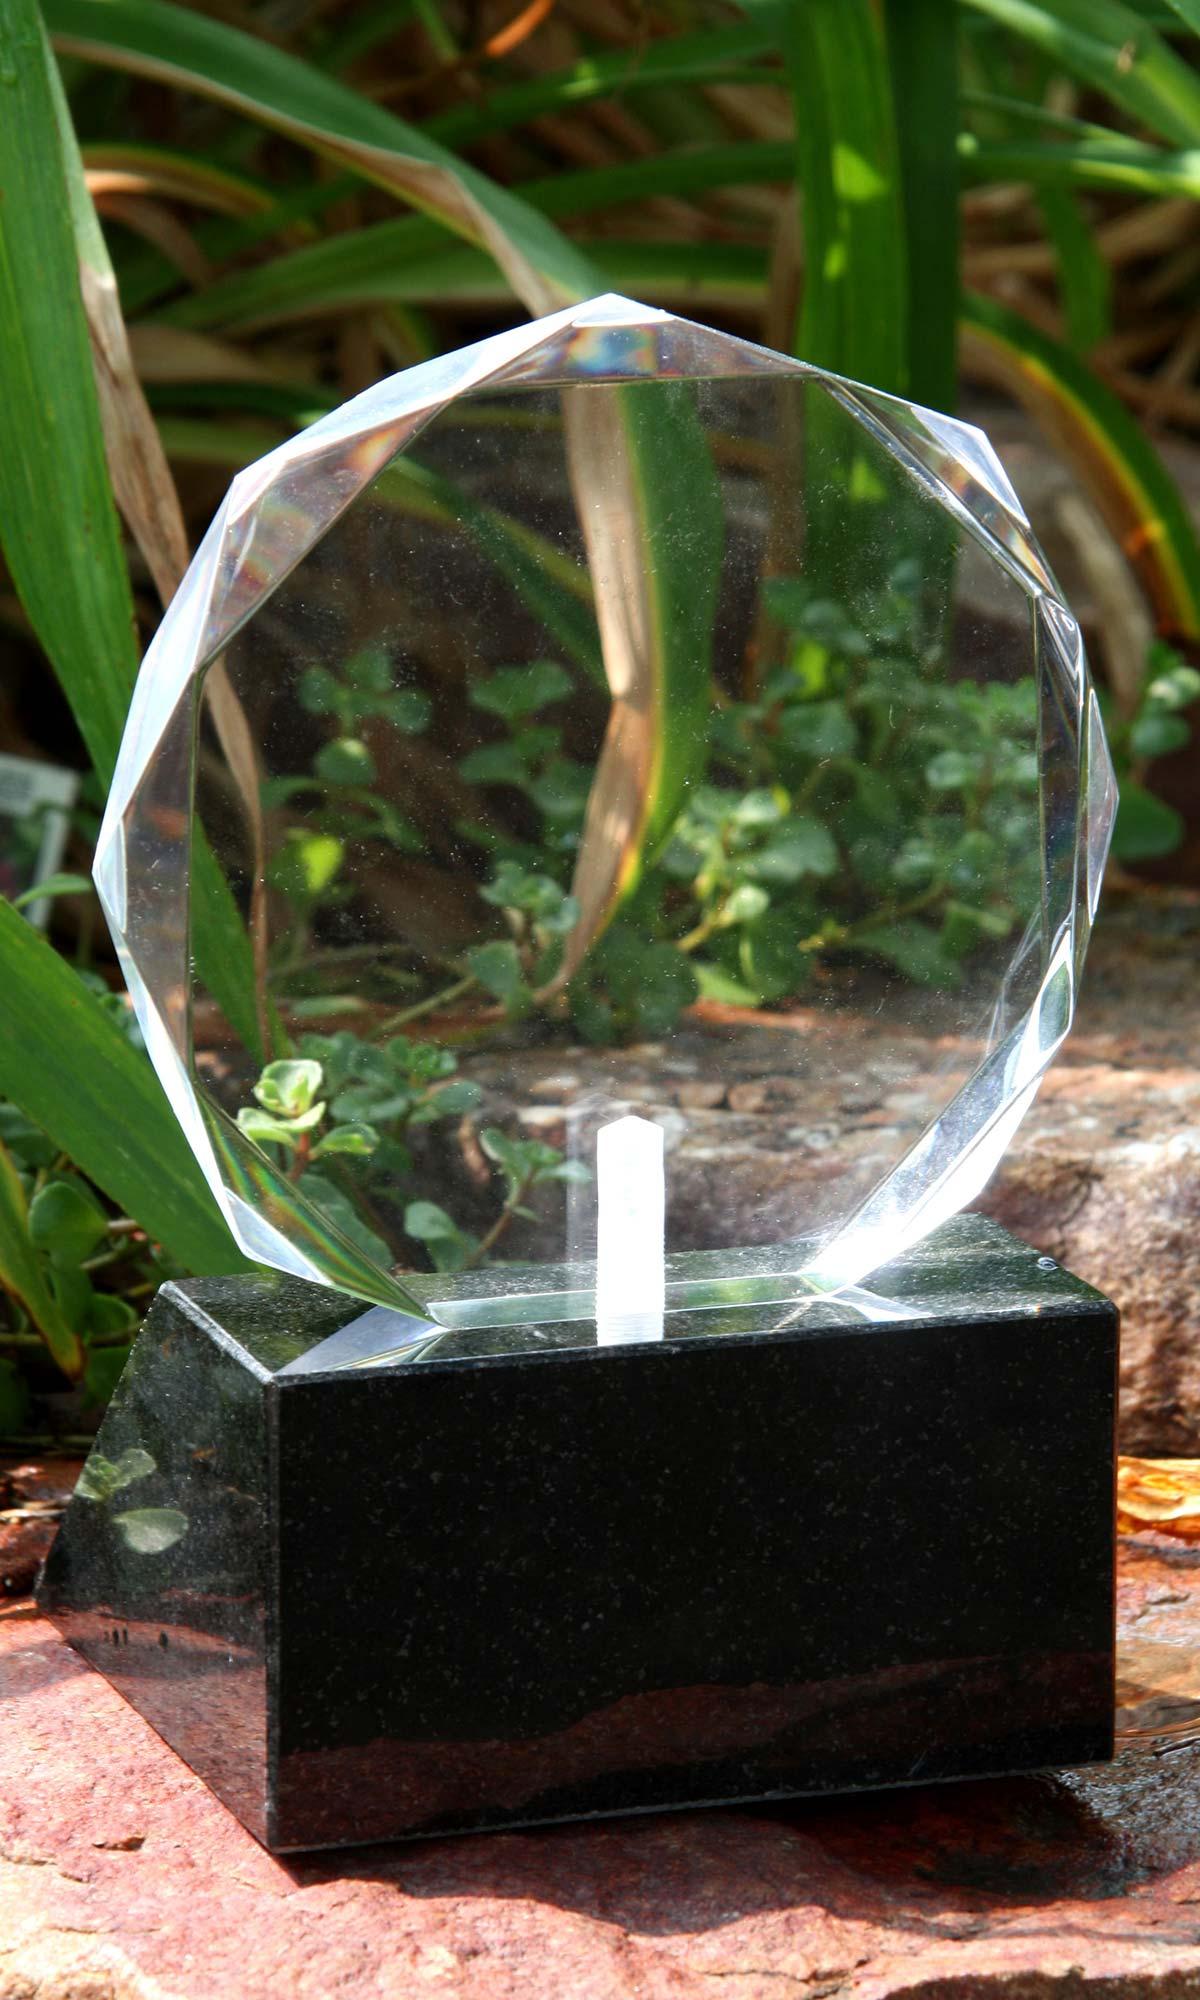 KKS-100 Kimberly (Octagon or Diamond Shaped)